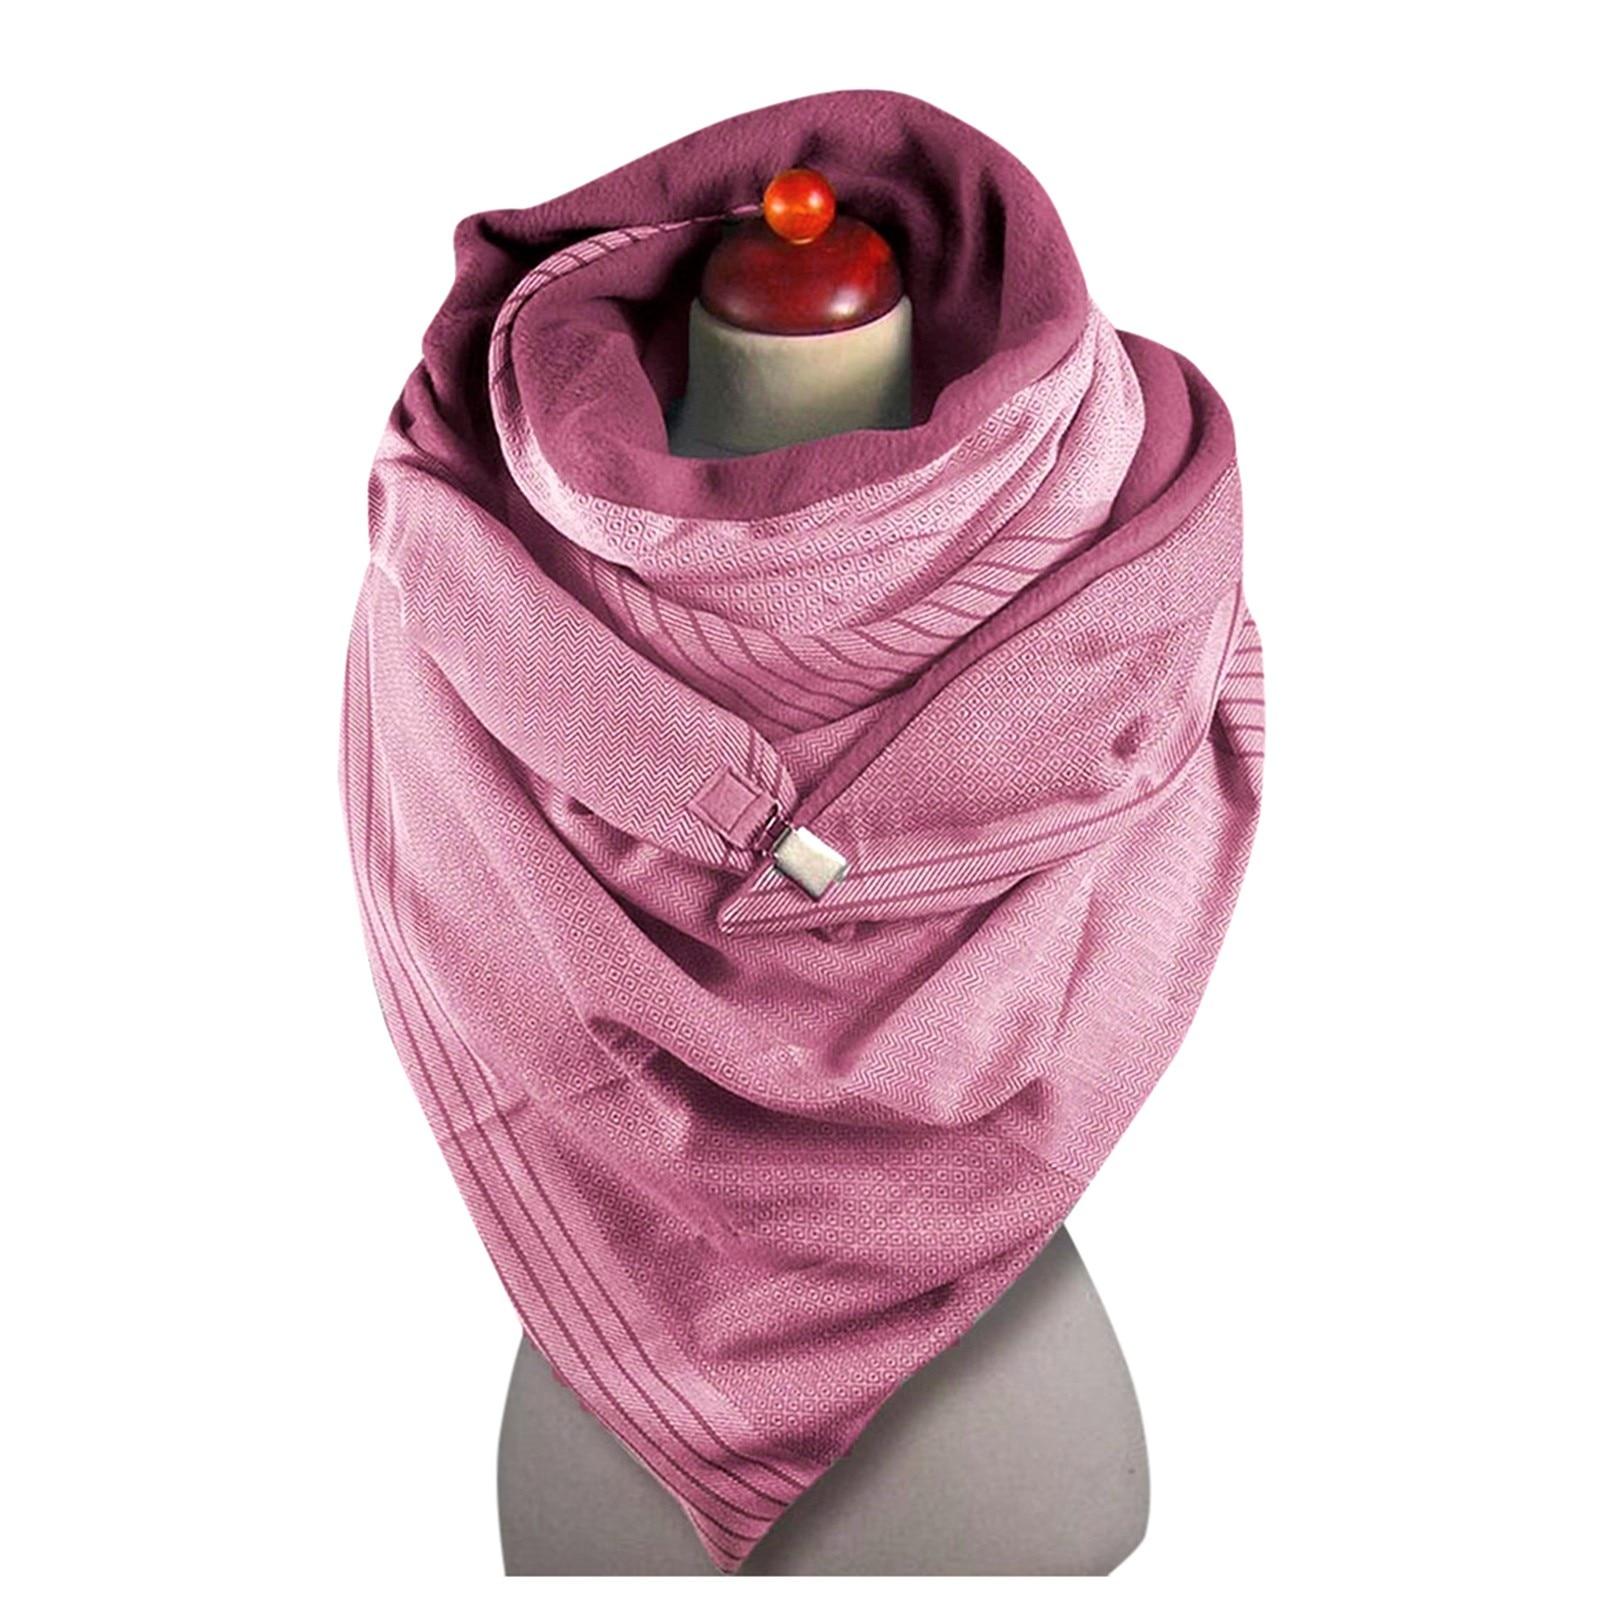 2020 Scarf Women Printing Scarf Fashion Retro Female Multi-Purpose Shawl Button Scarf шарф женский зимний